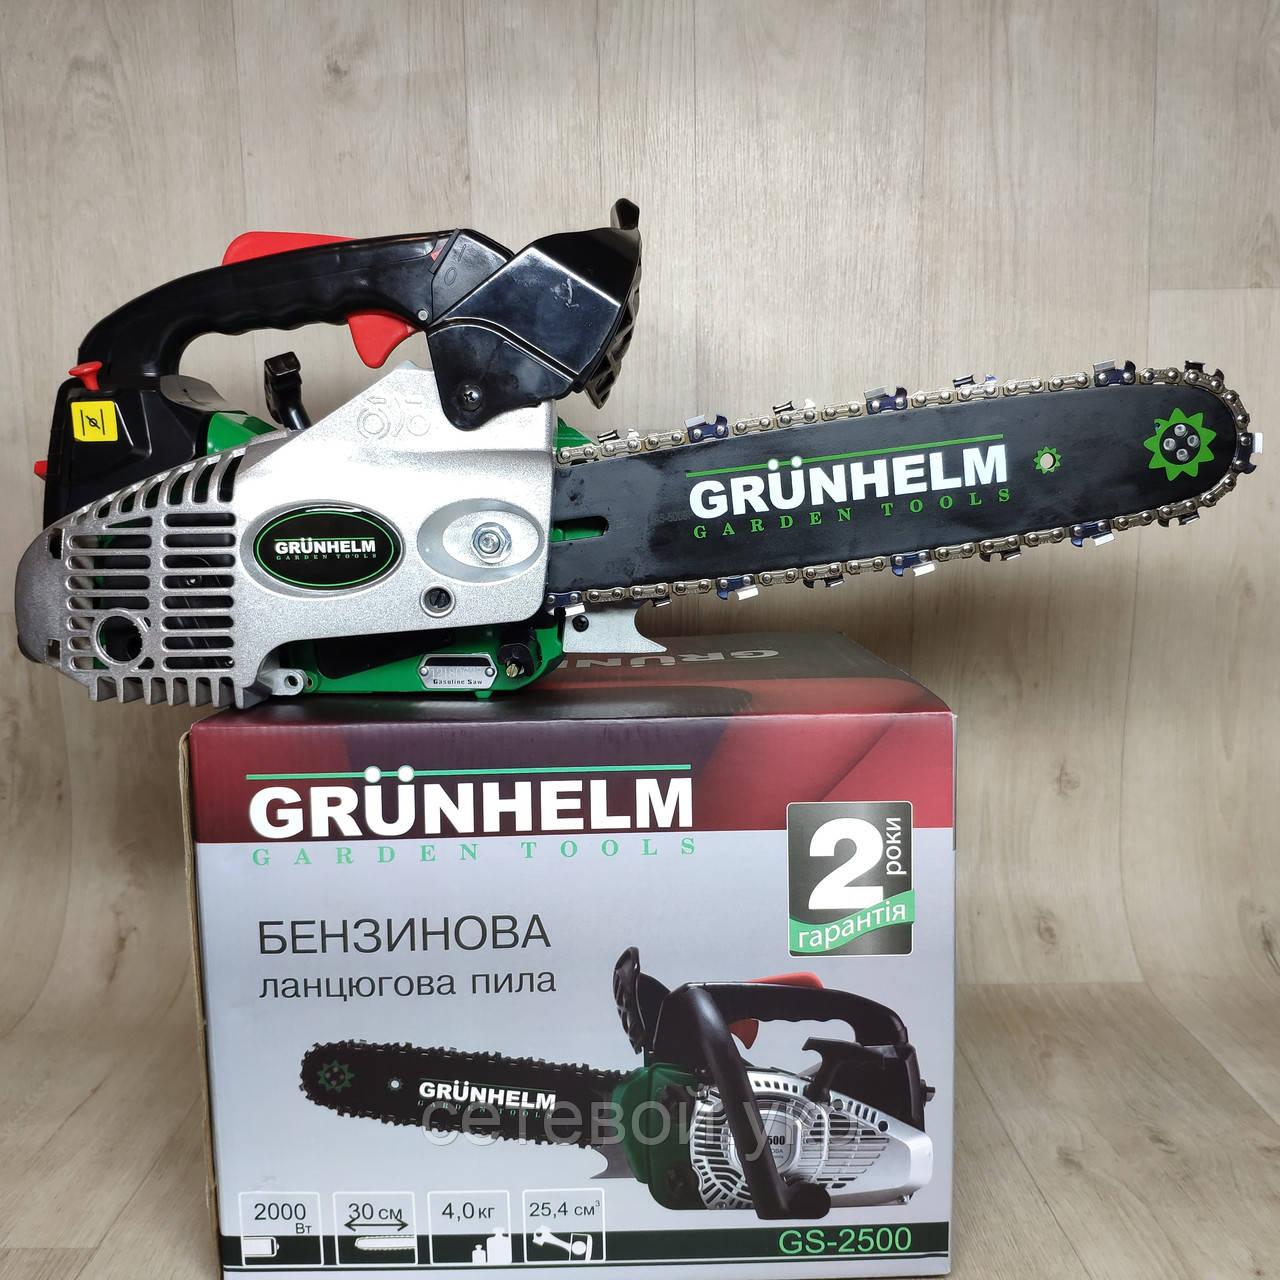 Одноручная маленькая  Бензопила Grunhelm GS-2500